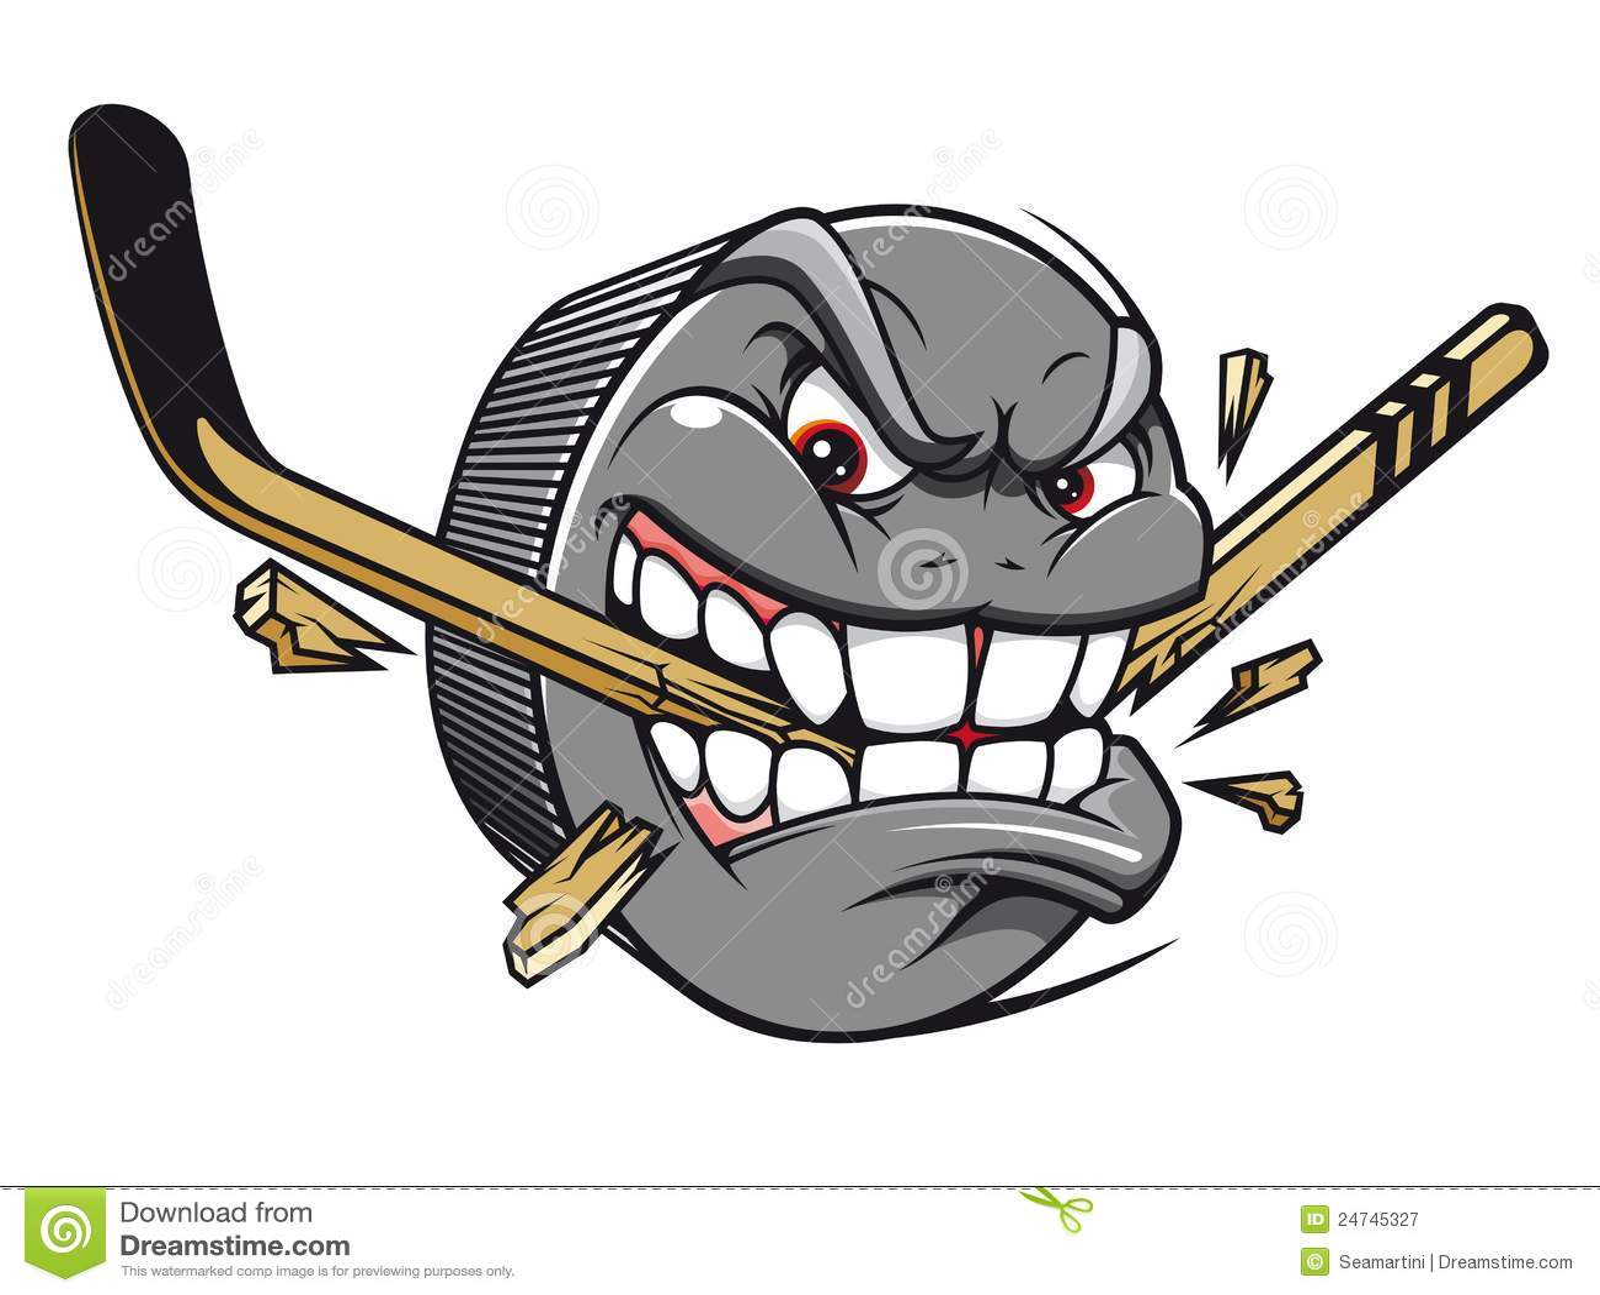 hight resolution of hockey puck mascot